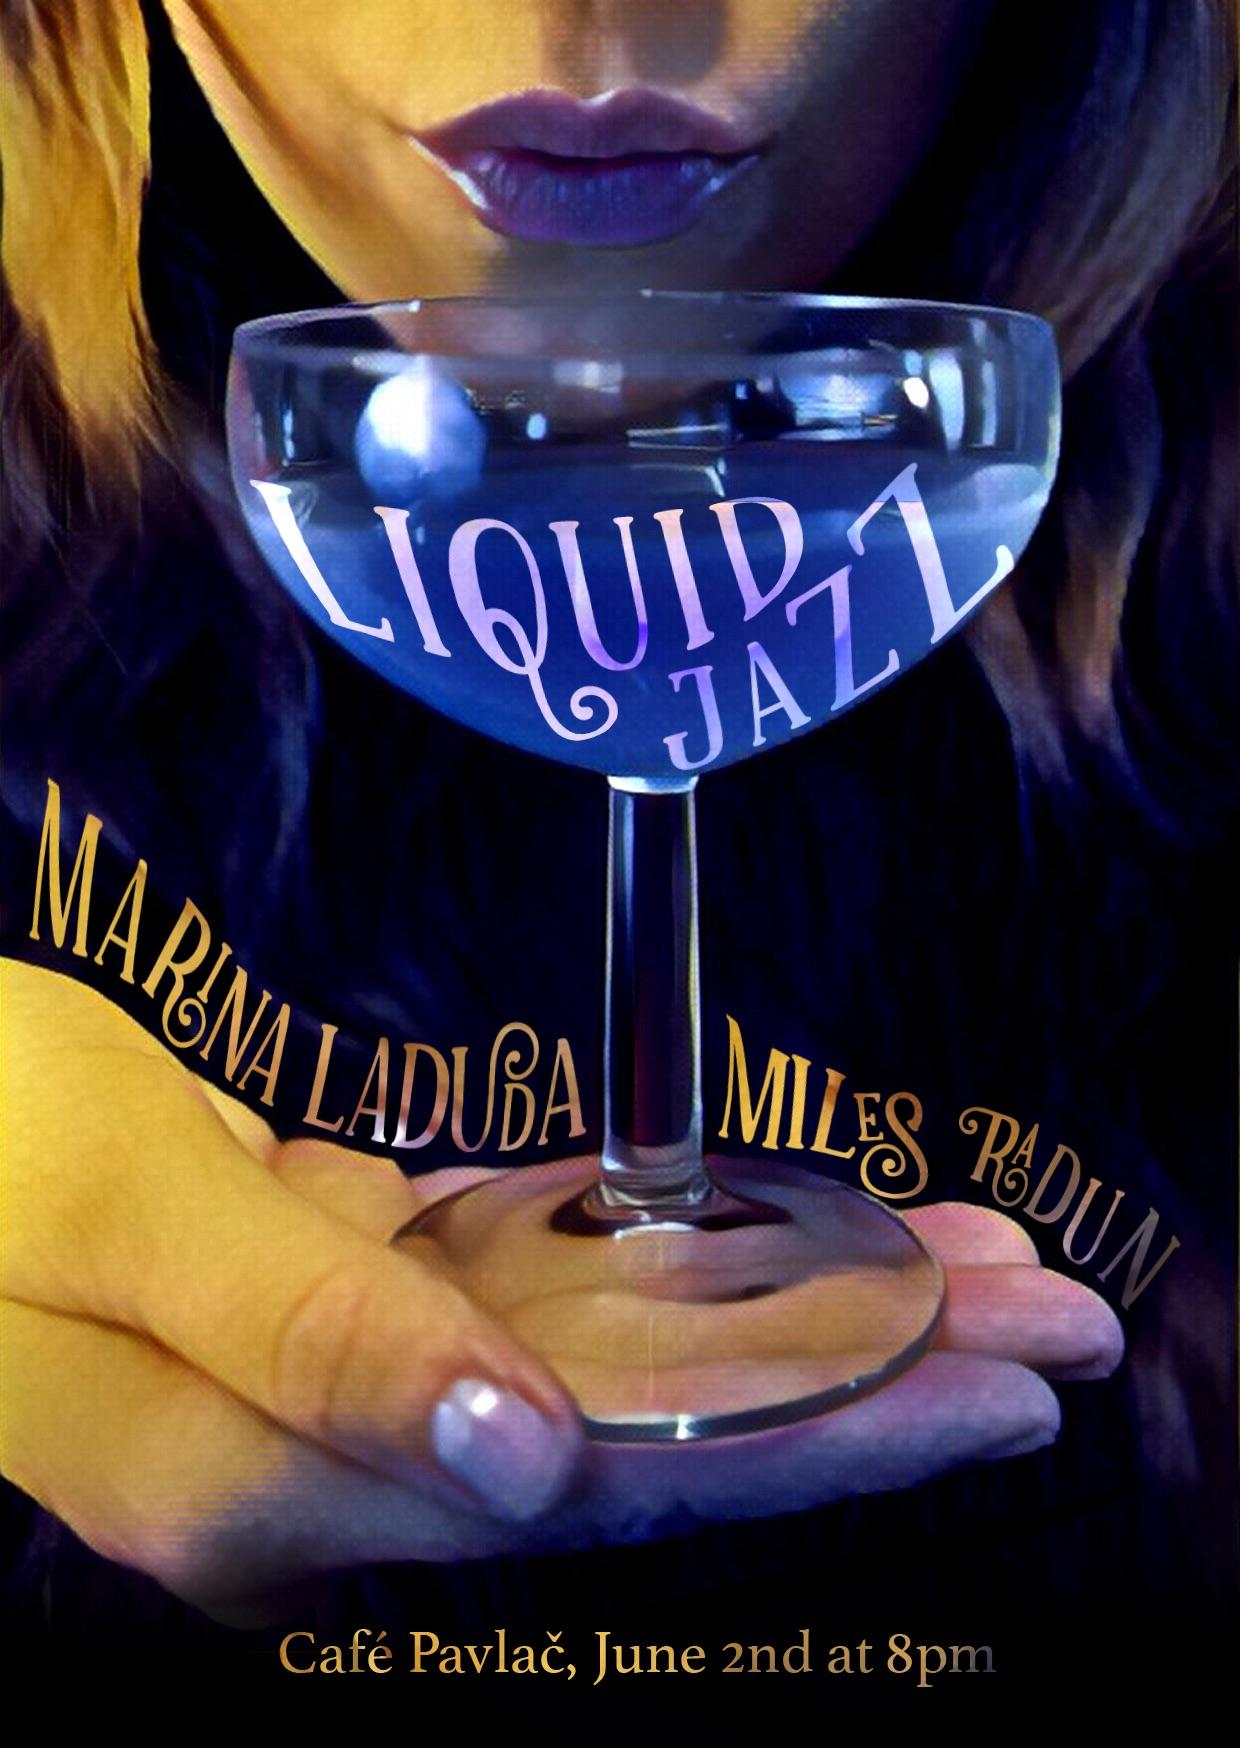 liquid jazz with marina laduda and miles radun in prague